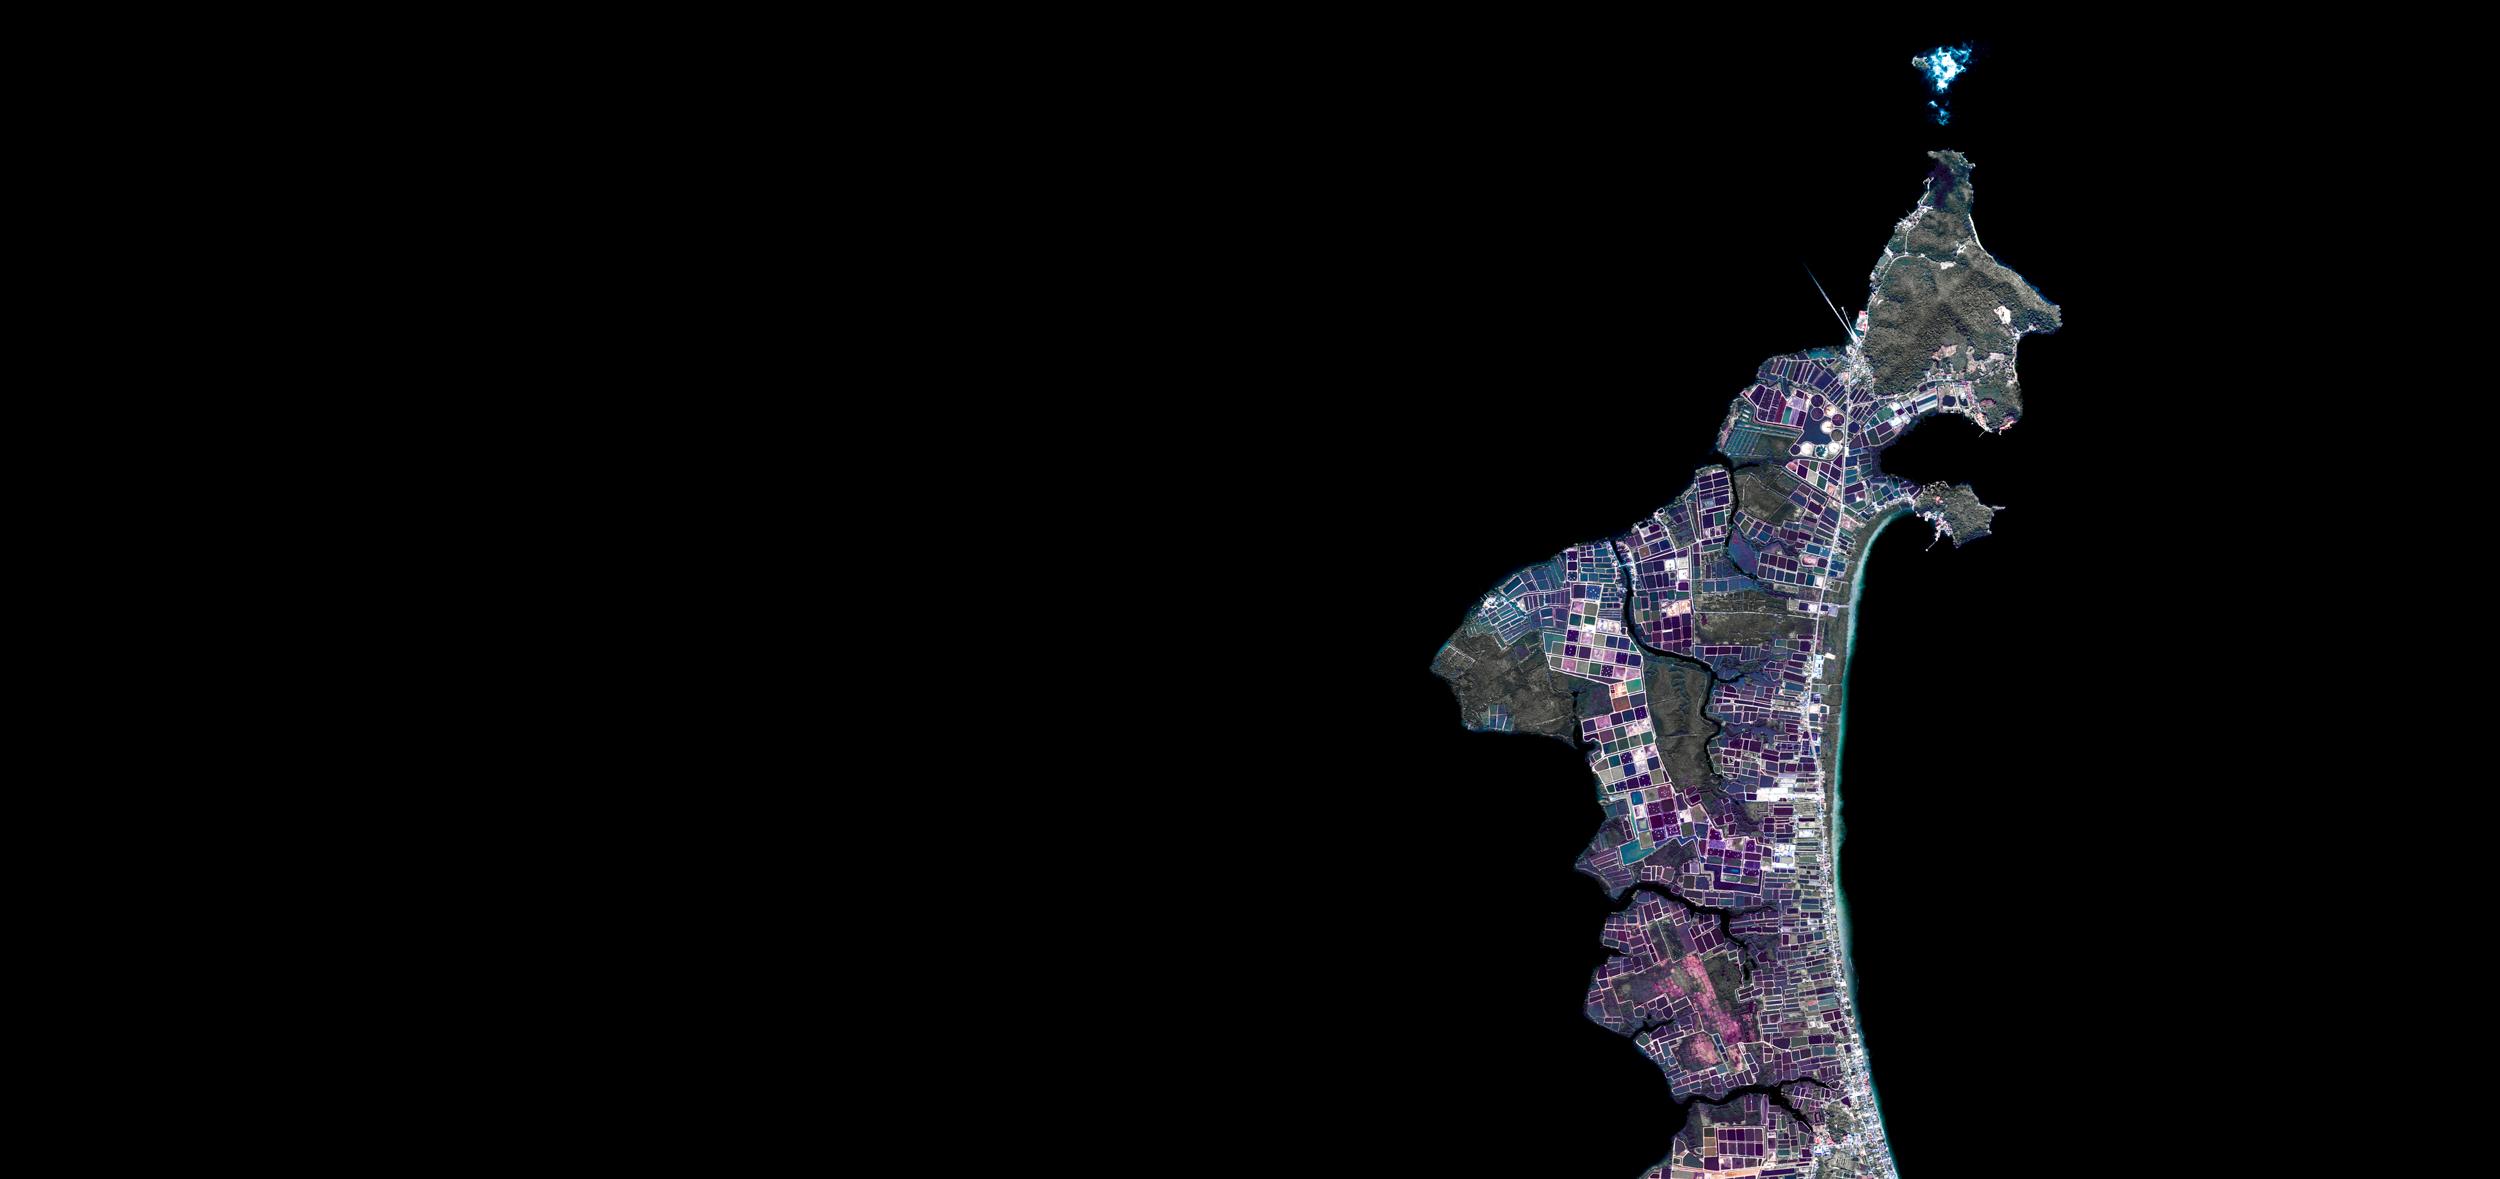 Bang-Kachai-ULTRADISTANCIA-©Federico-Winer.jpg